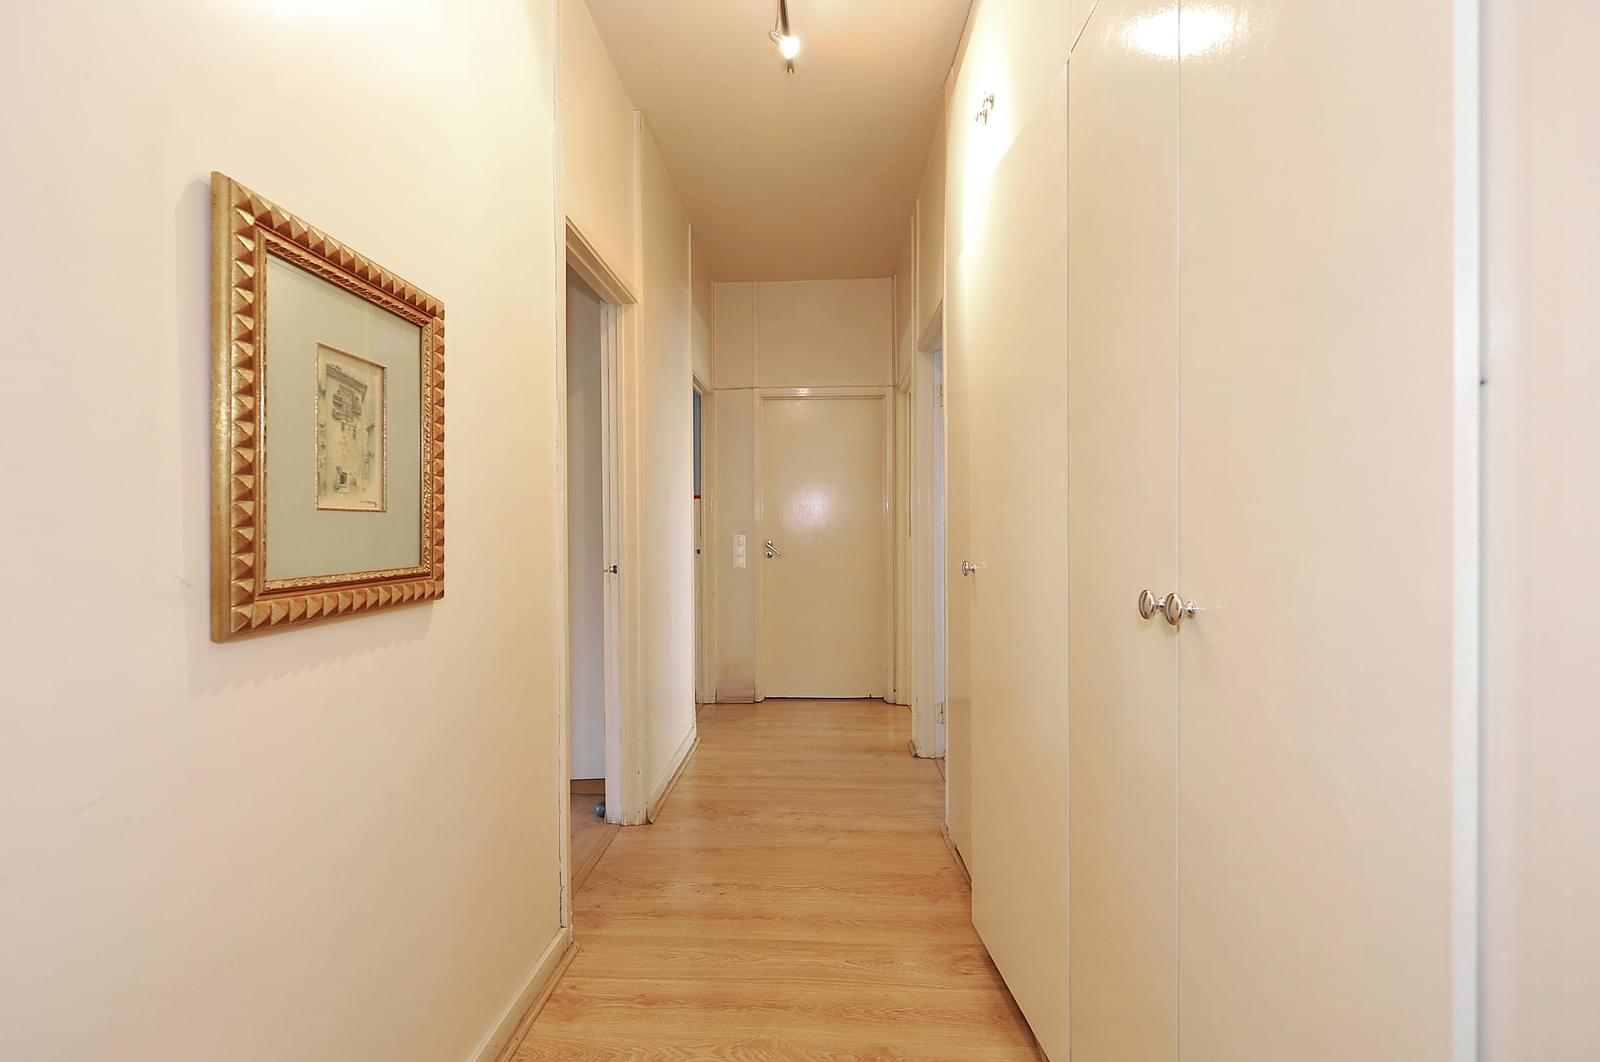 pf17071-apartamento-t4-oeiras-236f4f29-be4d-4e34-9c09-2a4fb0cda561